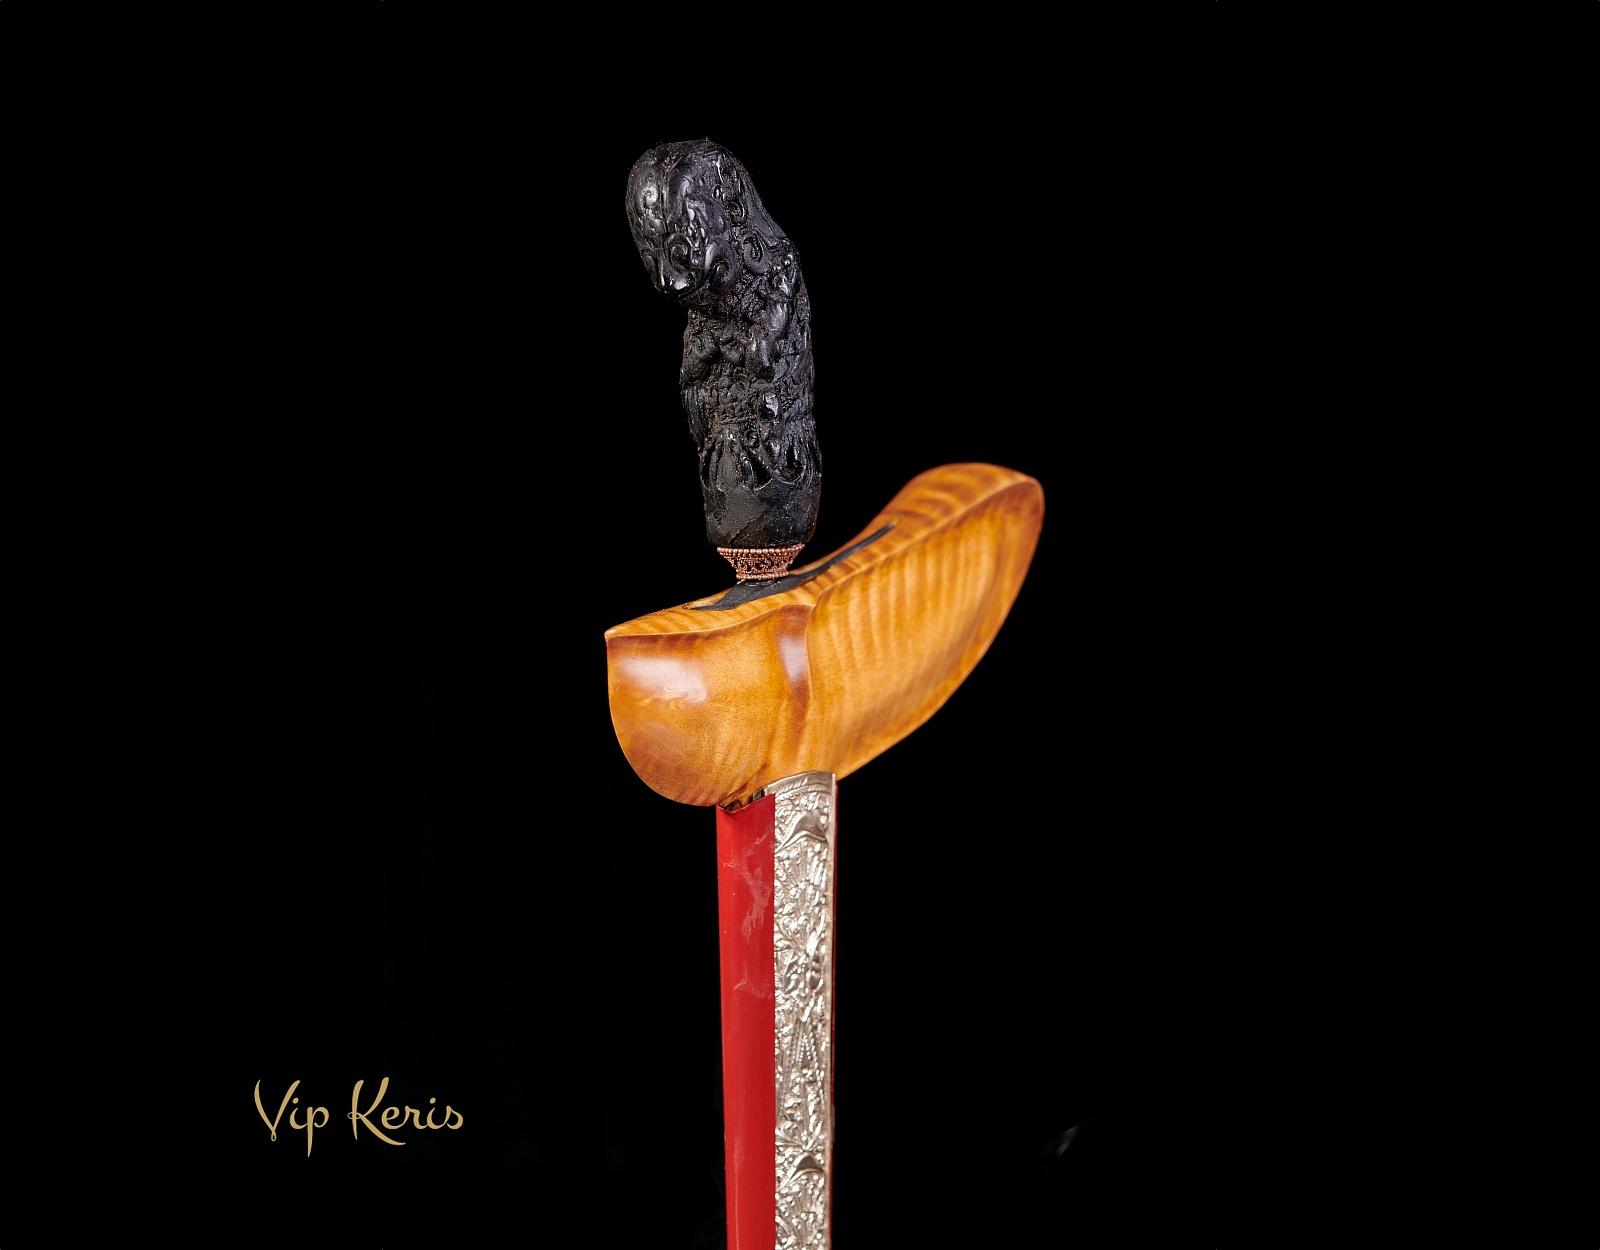 Кинжал Крис Jalak Tilam Sari фото VipKeris